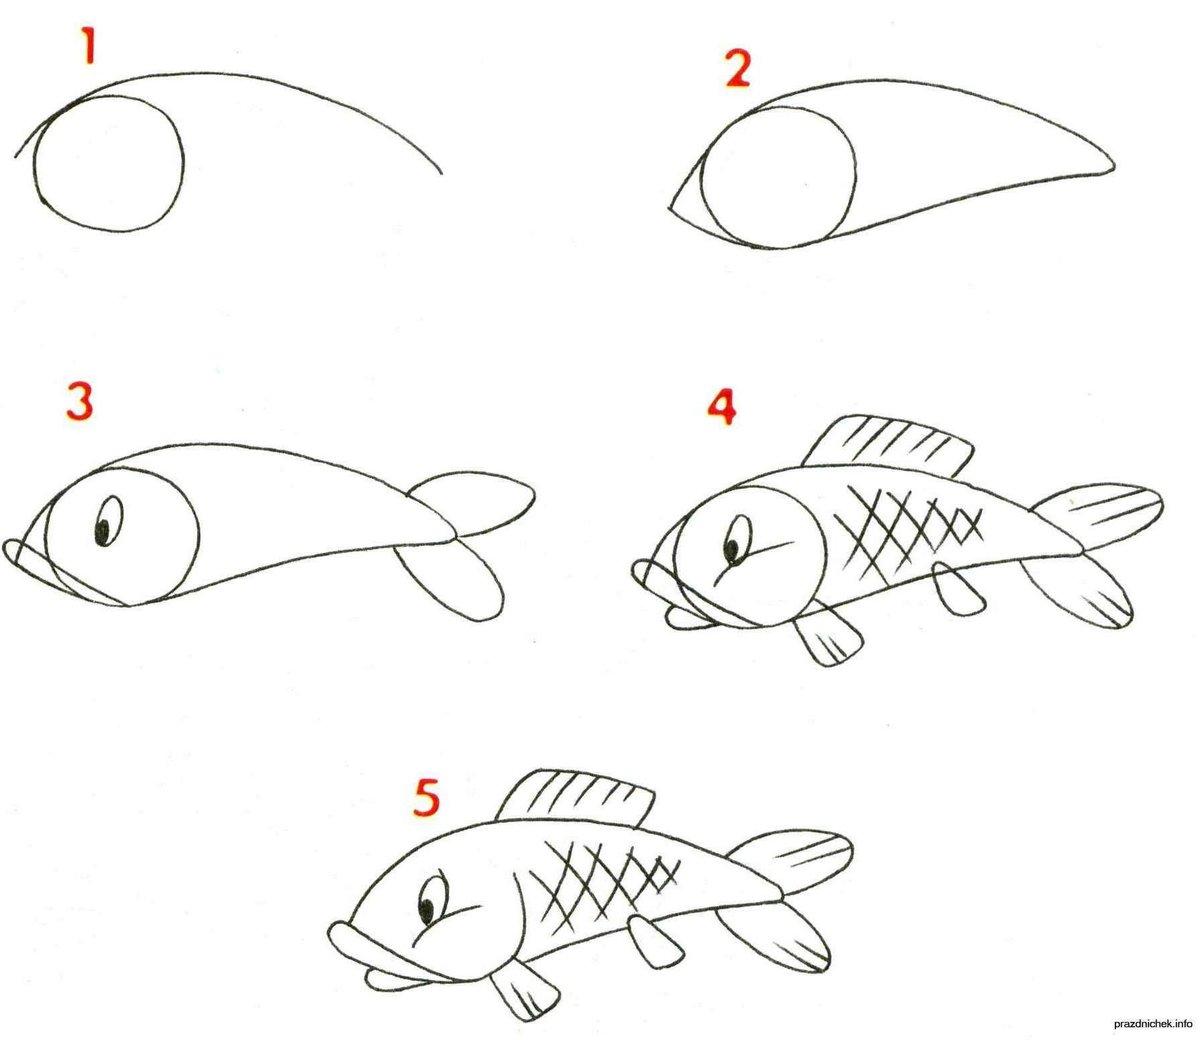 рисунок по схеме карандашом